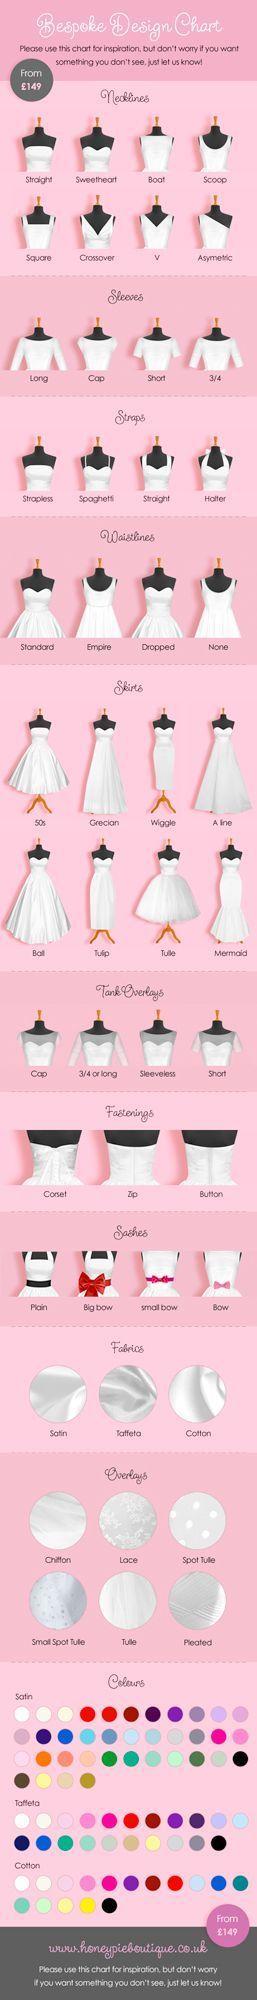 Bespoke wedding dress design chart, custom wedding dress, affordable, quirky alternative wedding dress (Top Design Wedding Invitations)